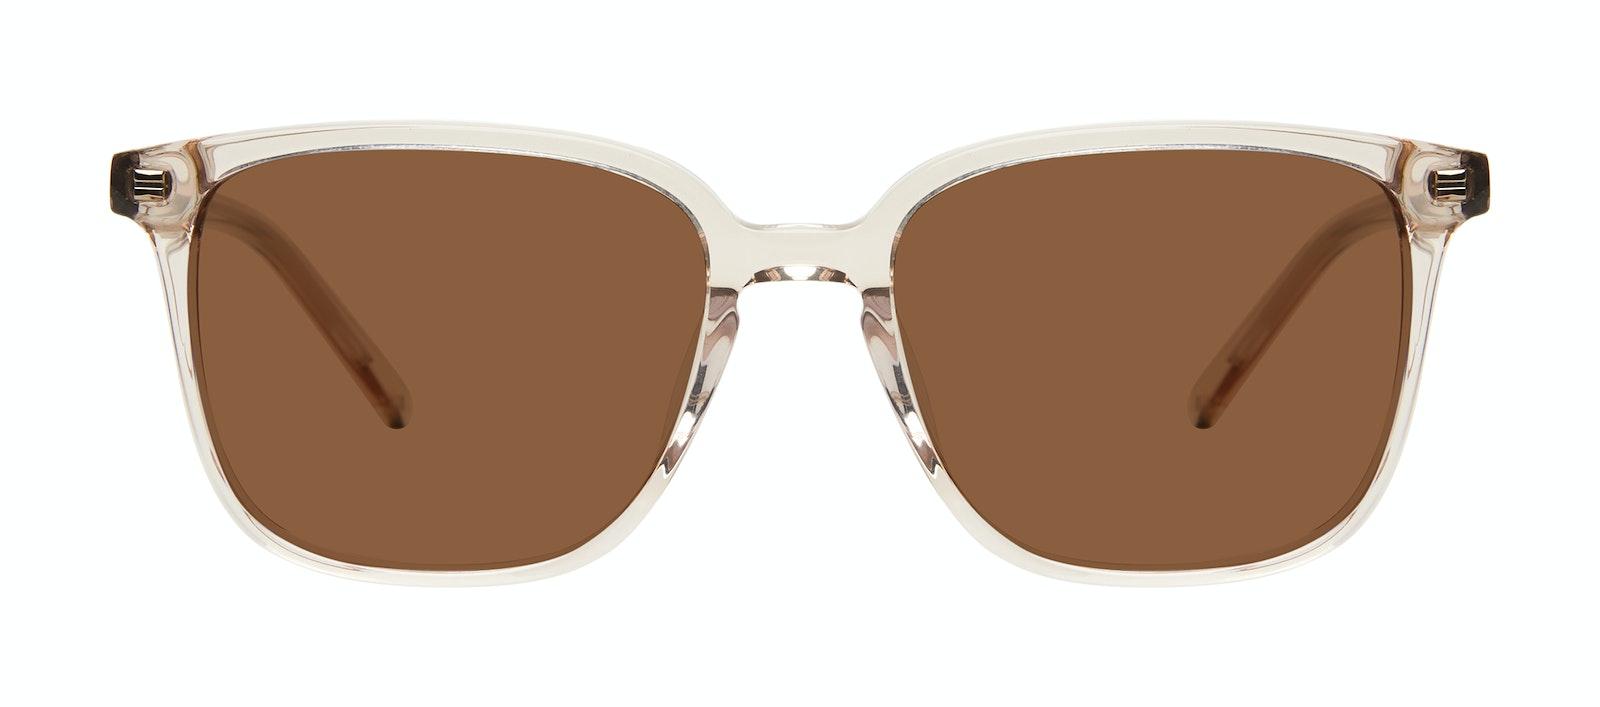 Affordable Fashion Glasses Square Sunglasses Men Fellow Golden Front